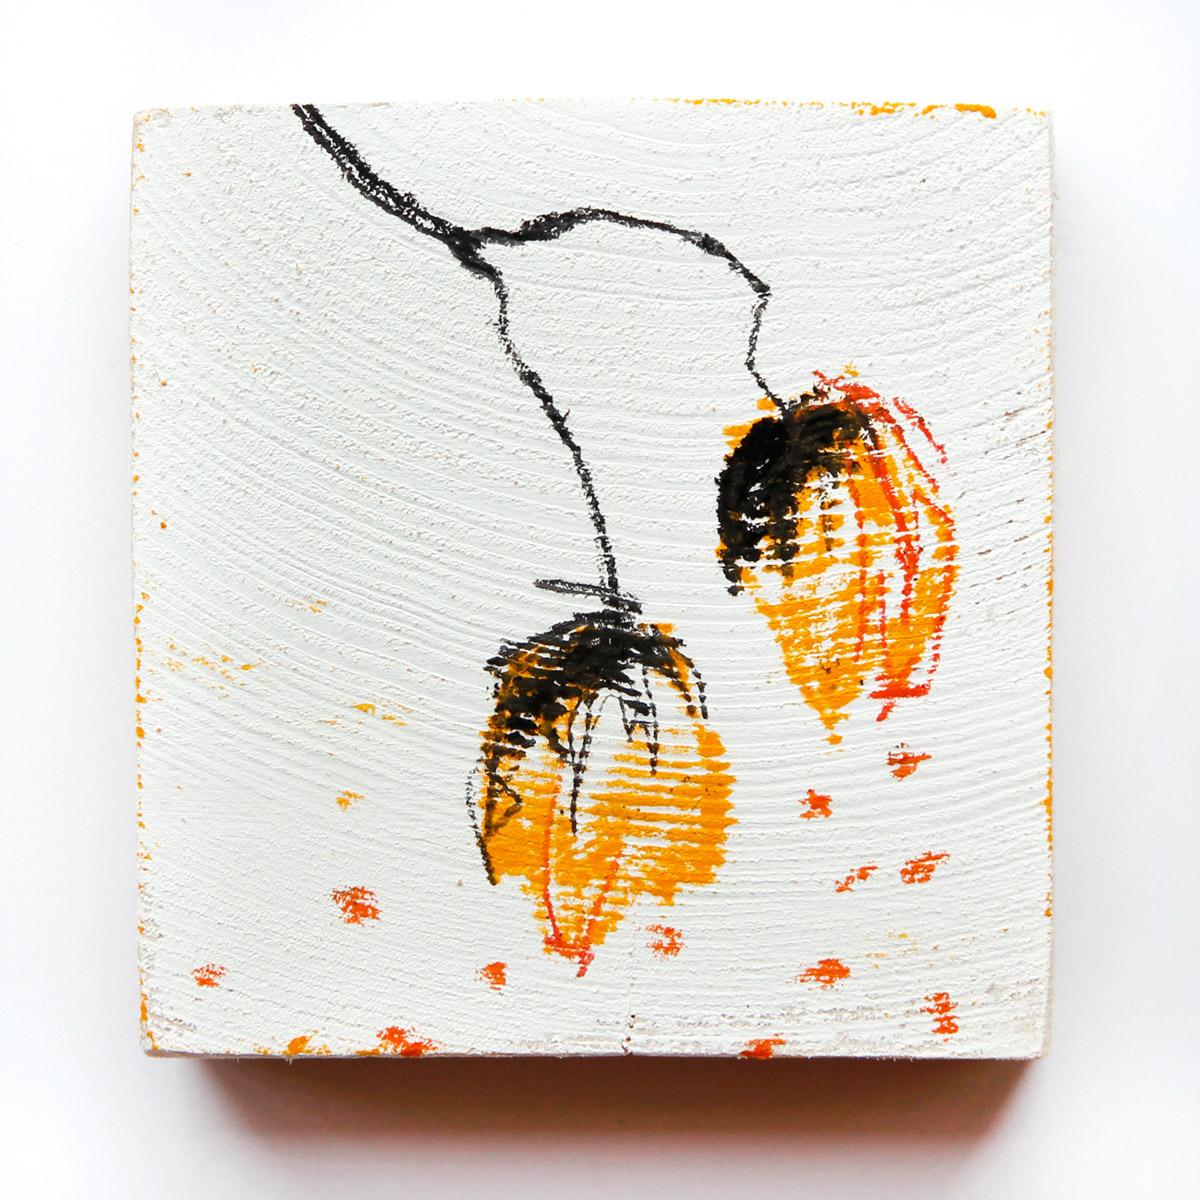 Mannigfaltig, 2020, Ölstick auf Holz, 9,5 cm x 10cm